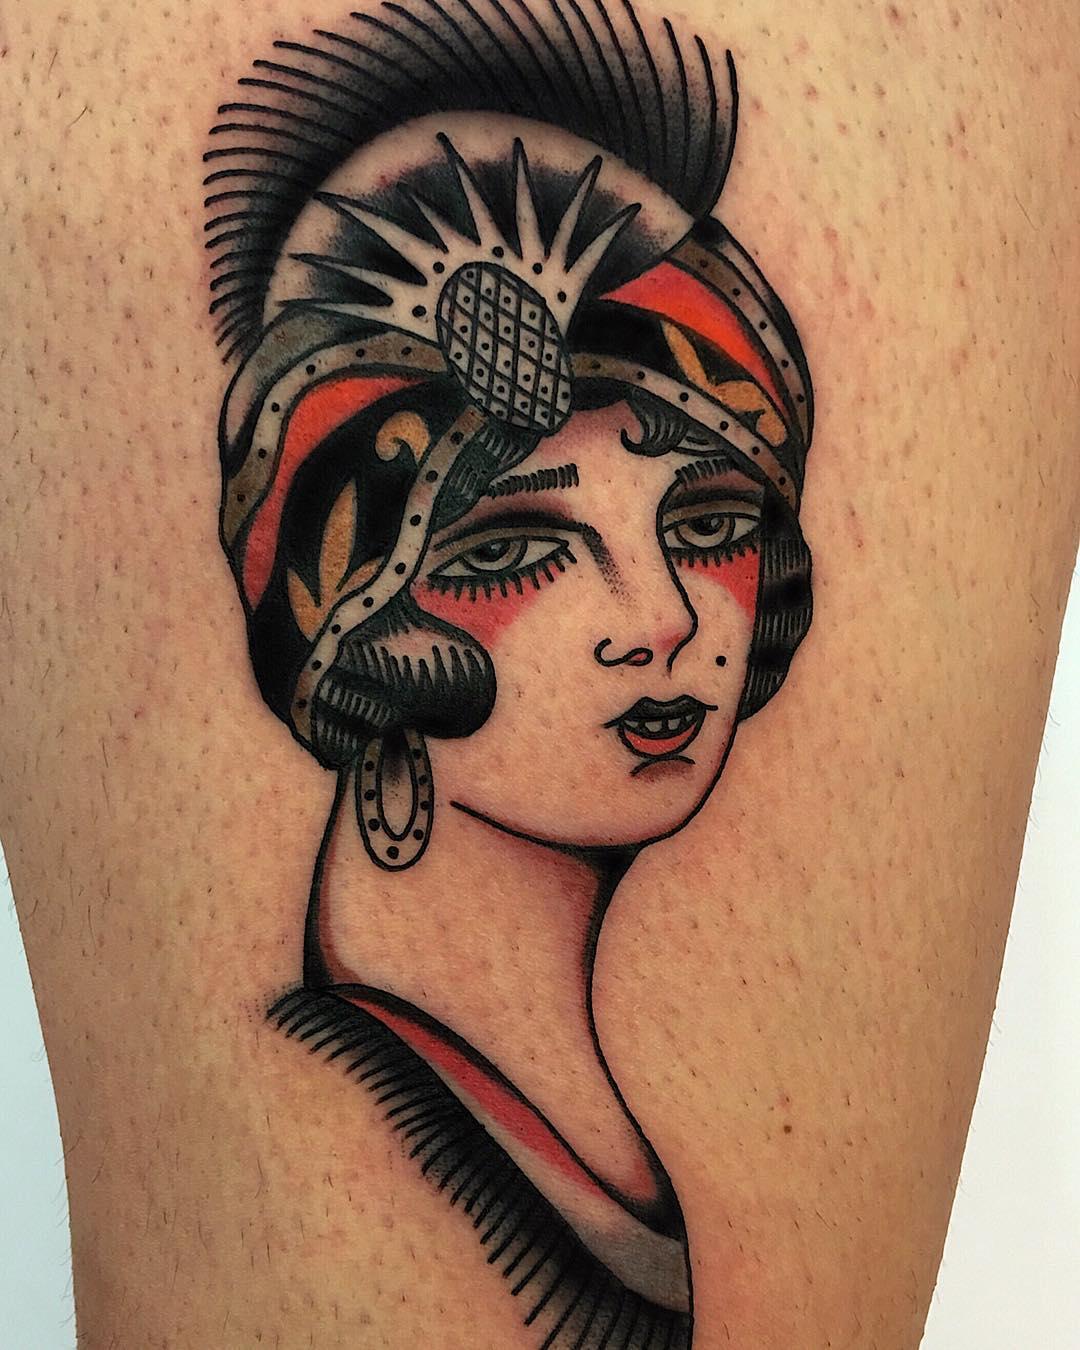 oldlines,followforfollow,followme,follow,ciudadreal,tattoos,ciudadrealtattoo,tattooshop,tattooers,besttattooers,juantabasco,ciudadrealsetatua,ink,inkmaster,tatuajes,realismo,realistictattoo,ciudadrealtattoo,americanatattoos,traditionaltattoos,music,eeuu,inked,inkedlife,inkedsociety,art,amazingink,tattooart,oldlines,oldschooltattoo,topclasstattooing